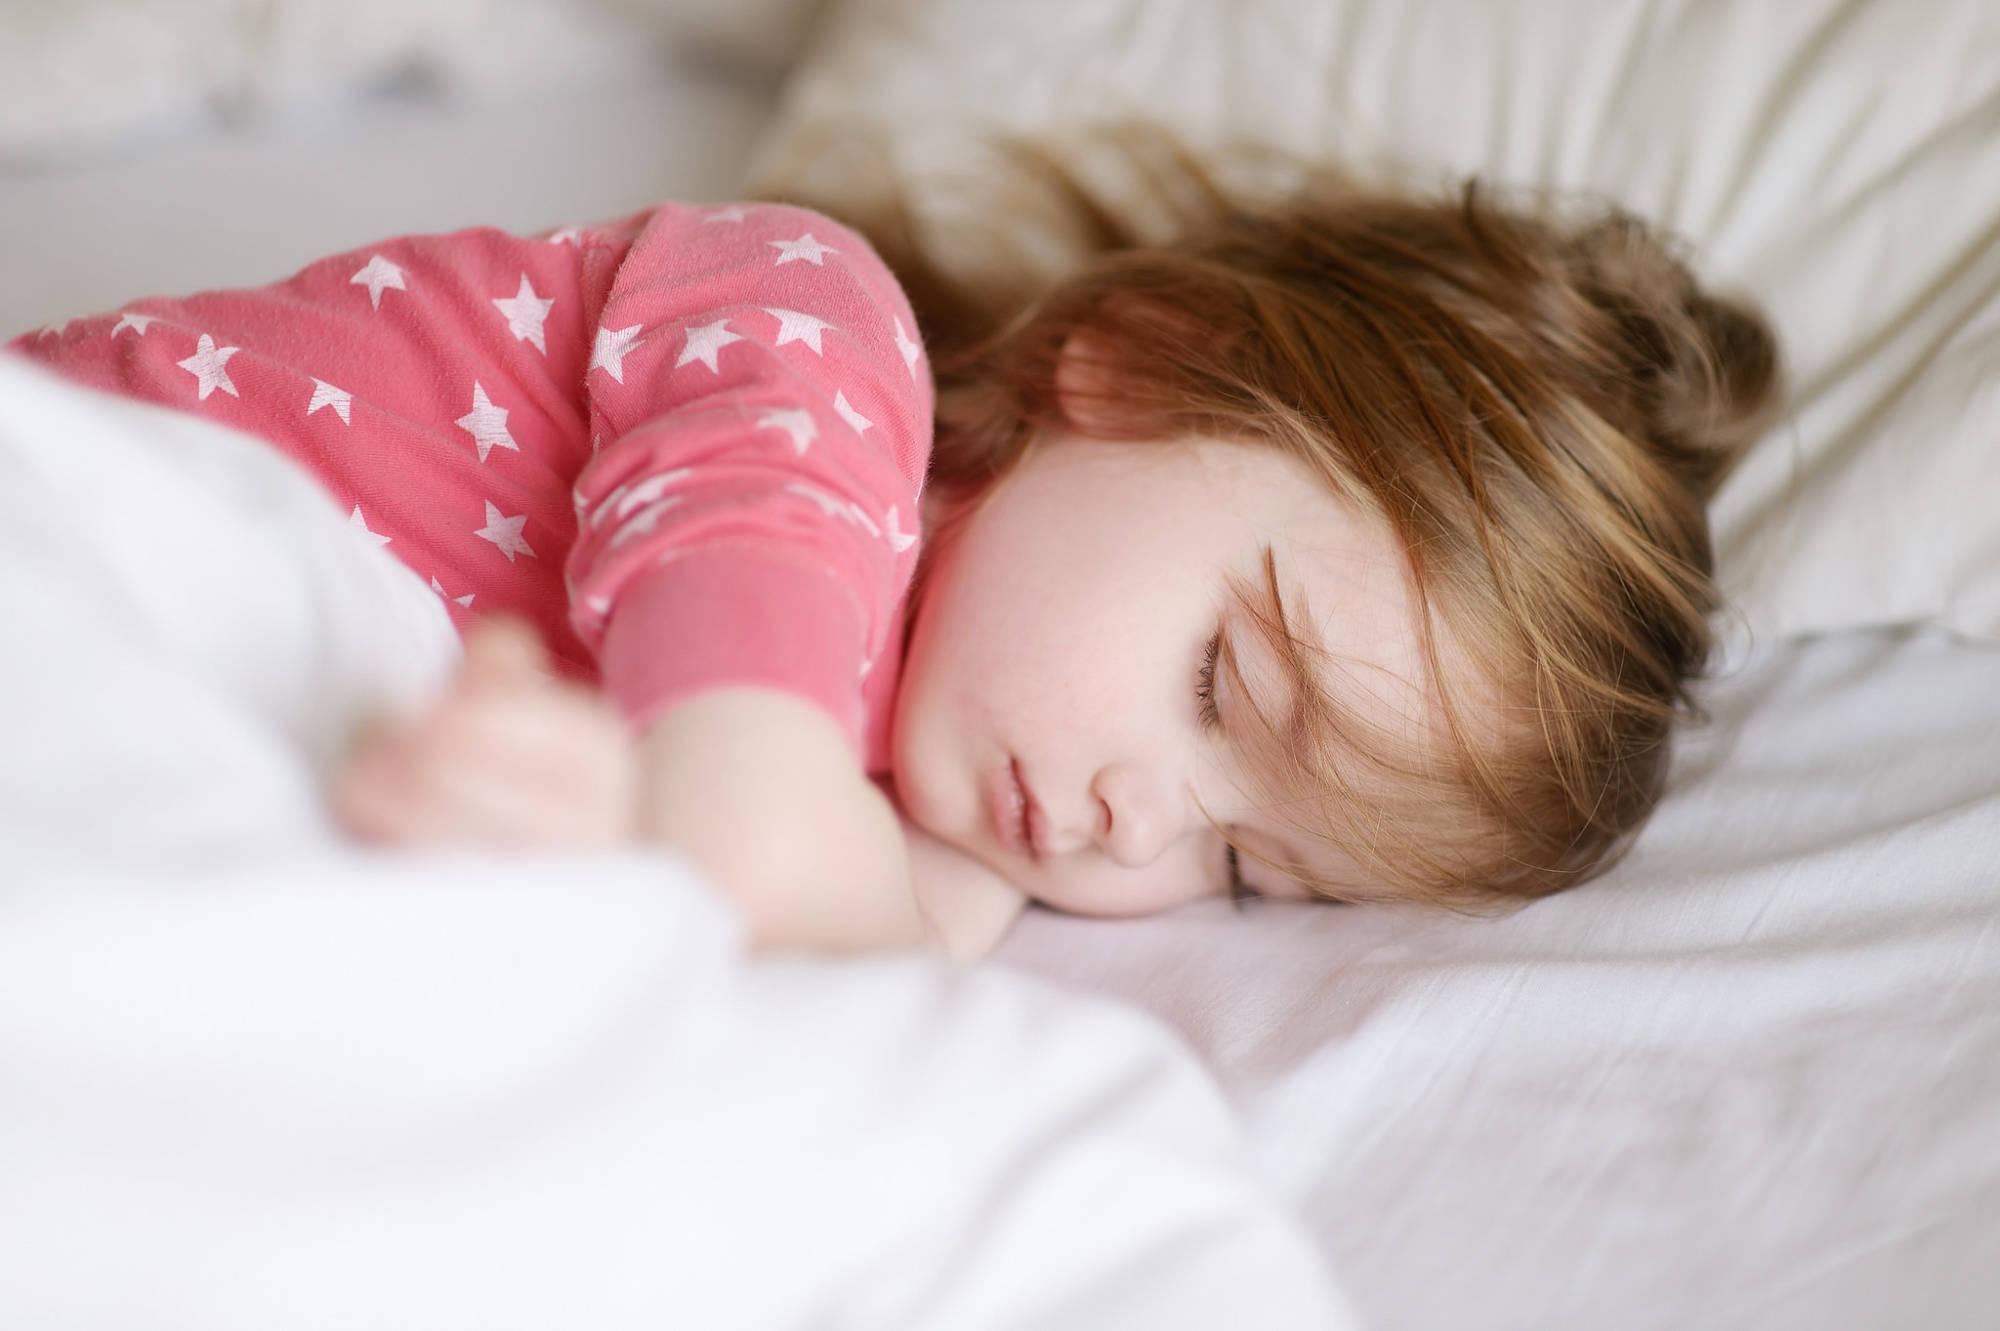 Девочка сладко спит картинки